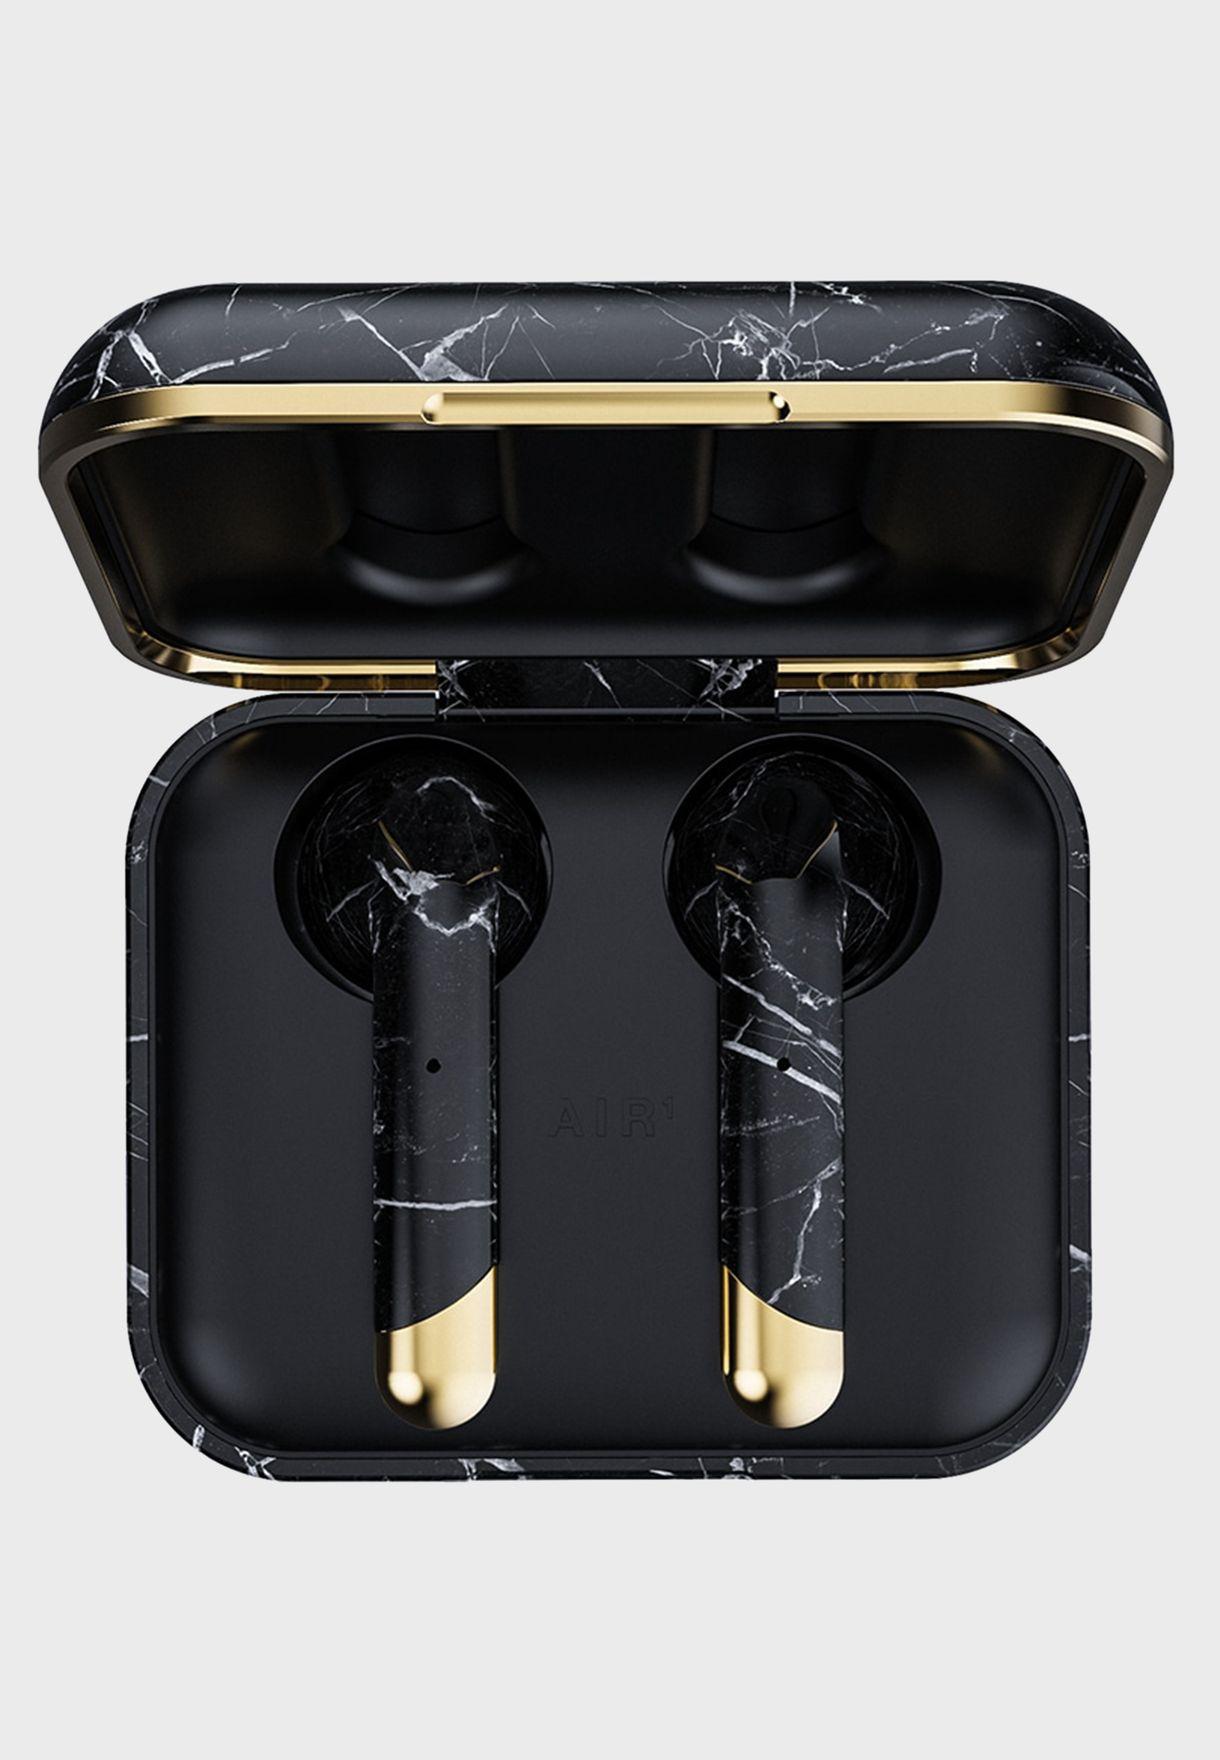 Air 1 Plus True Limited Edition Earphones